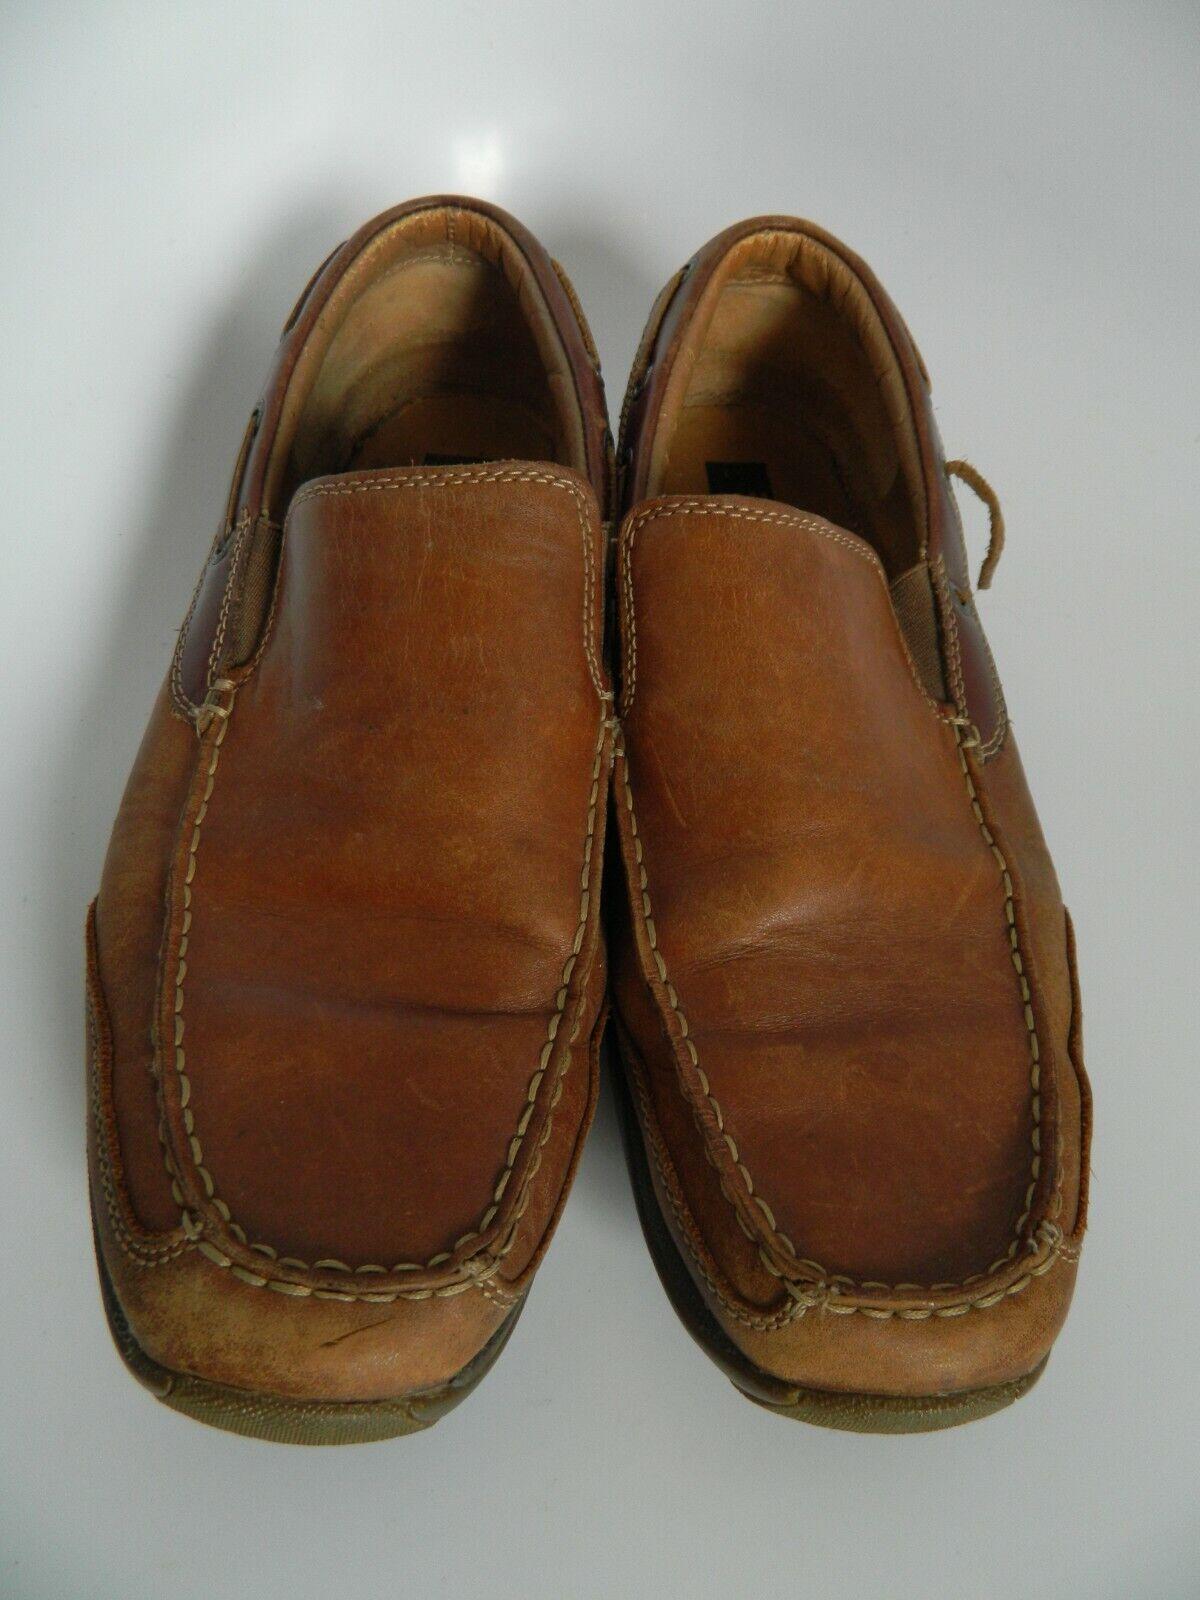 Johnston & Murphy Sheepskin XC4 System Dual Width Brown Loafers Size 12M